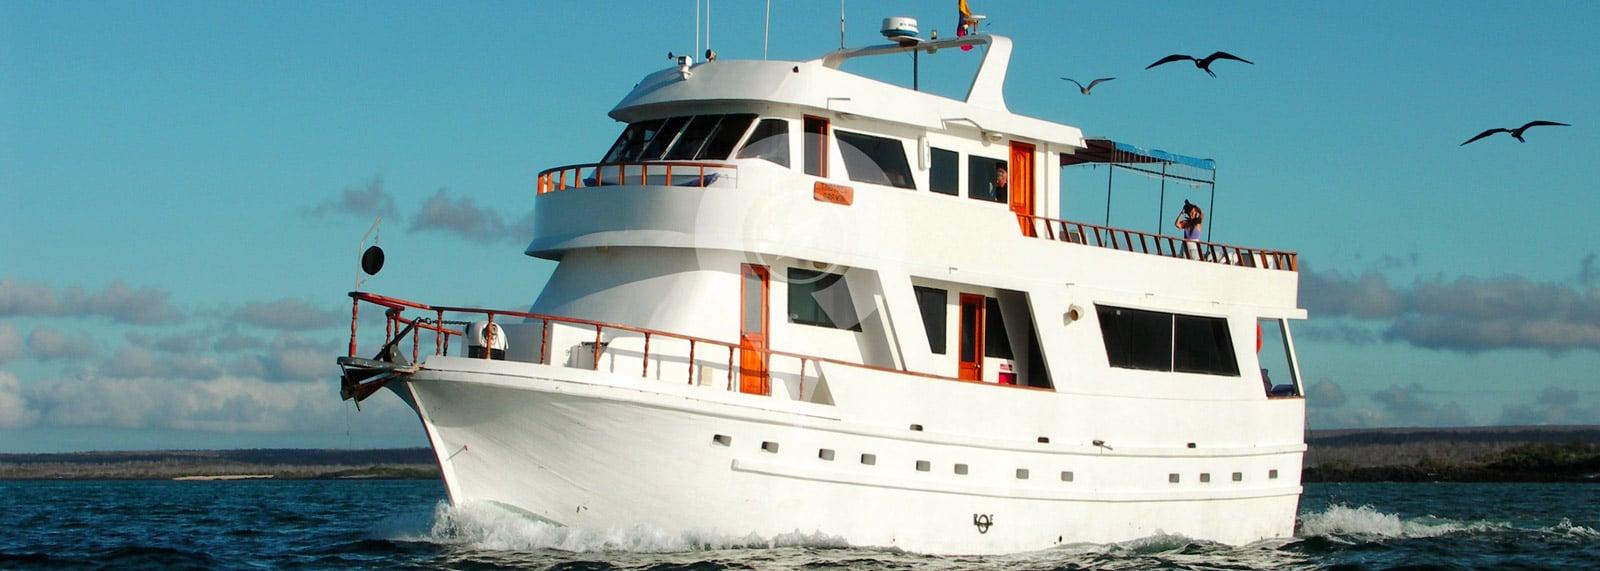 Darwin Galapagos Yacht